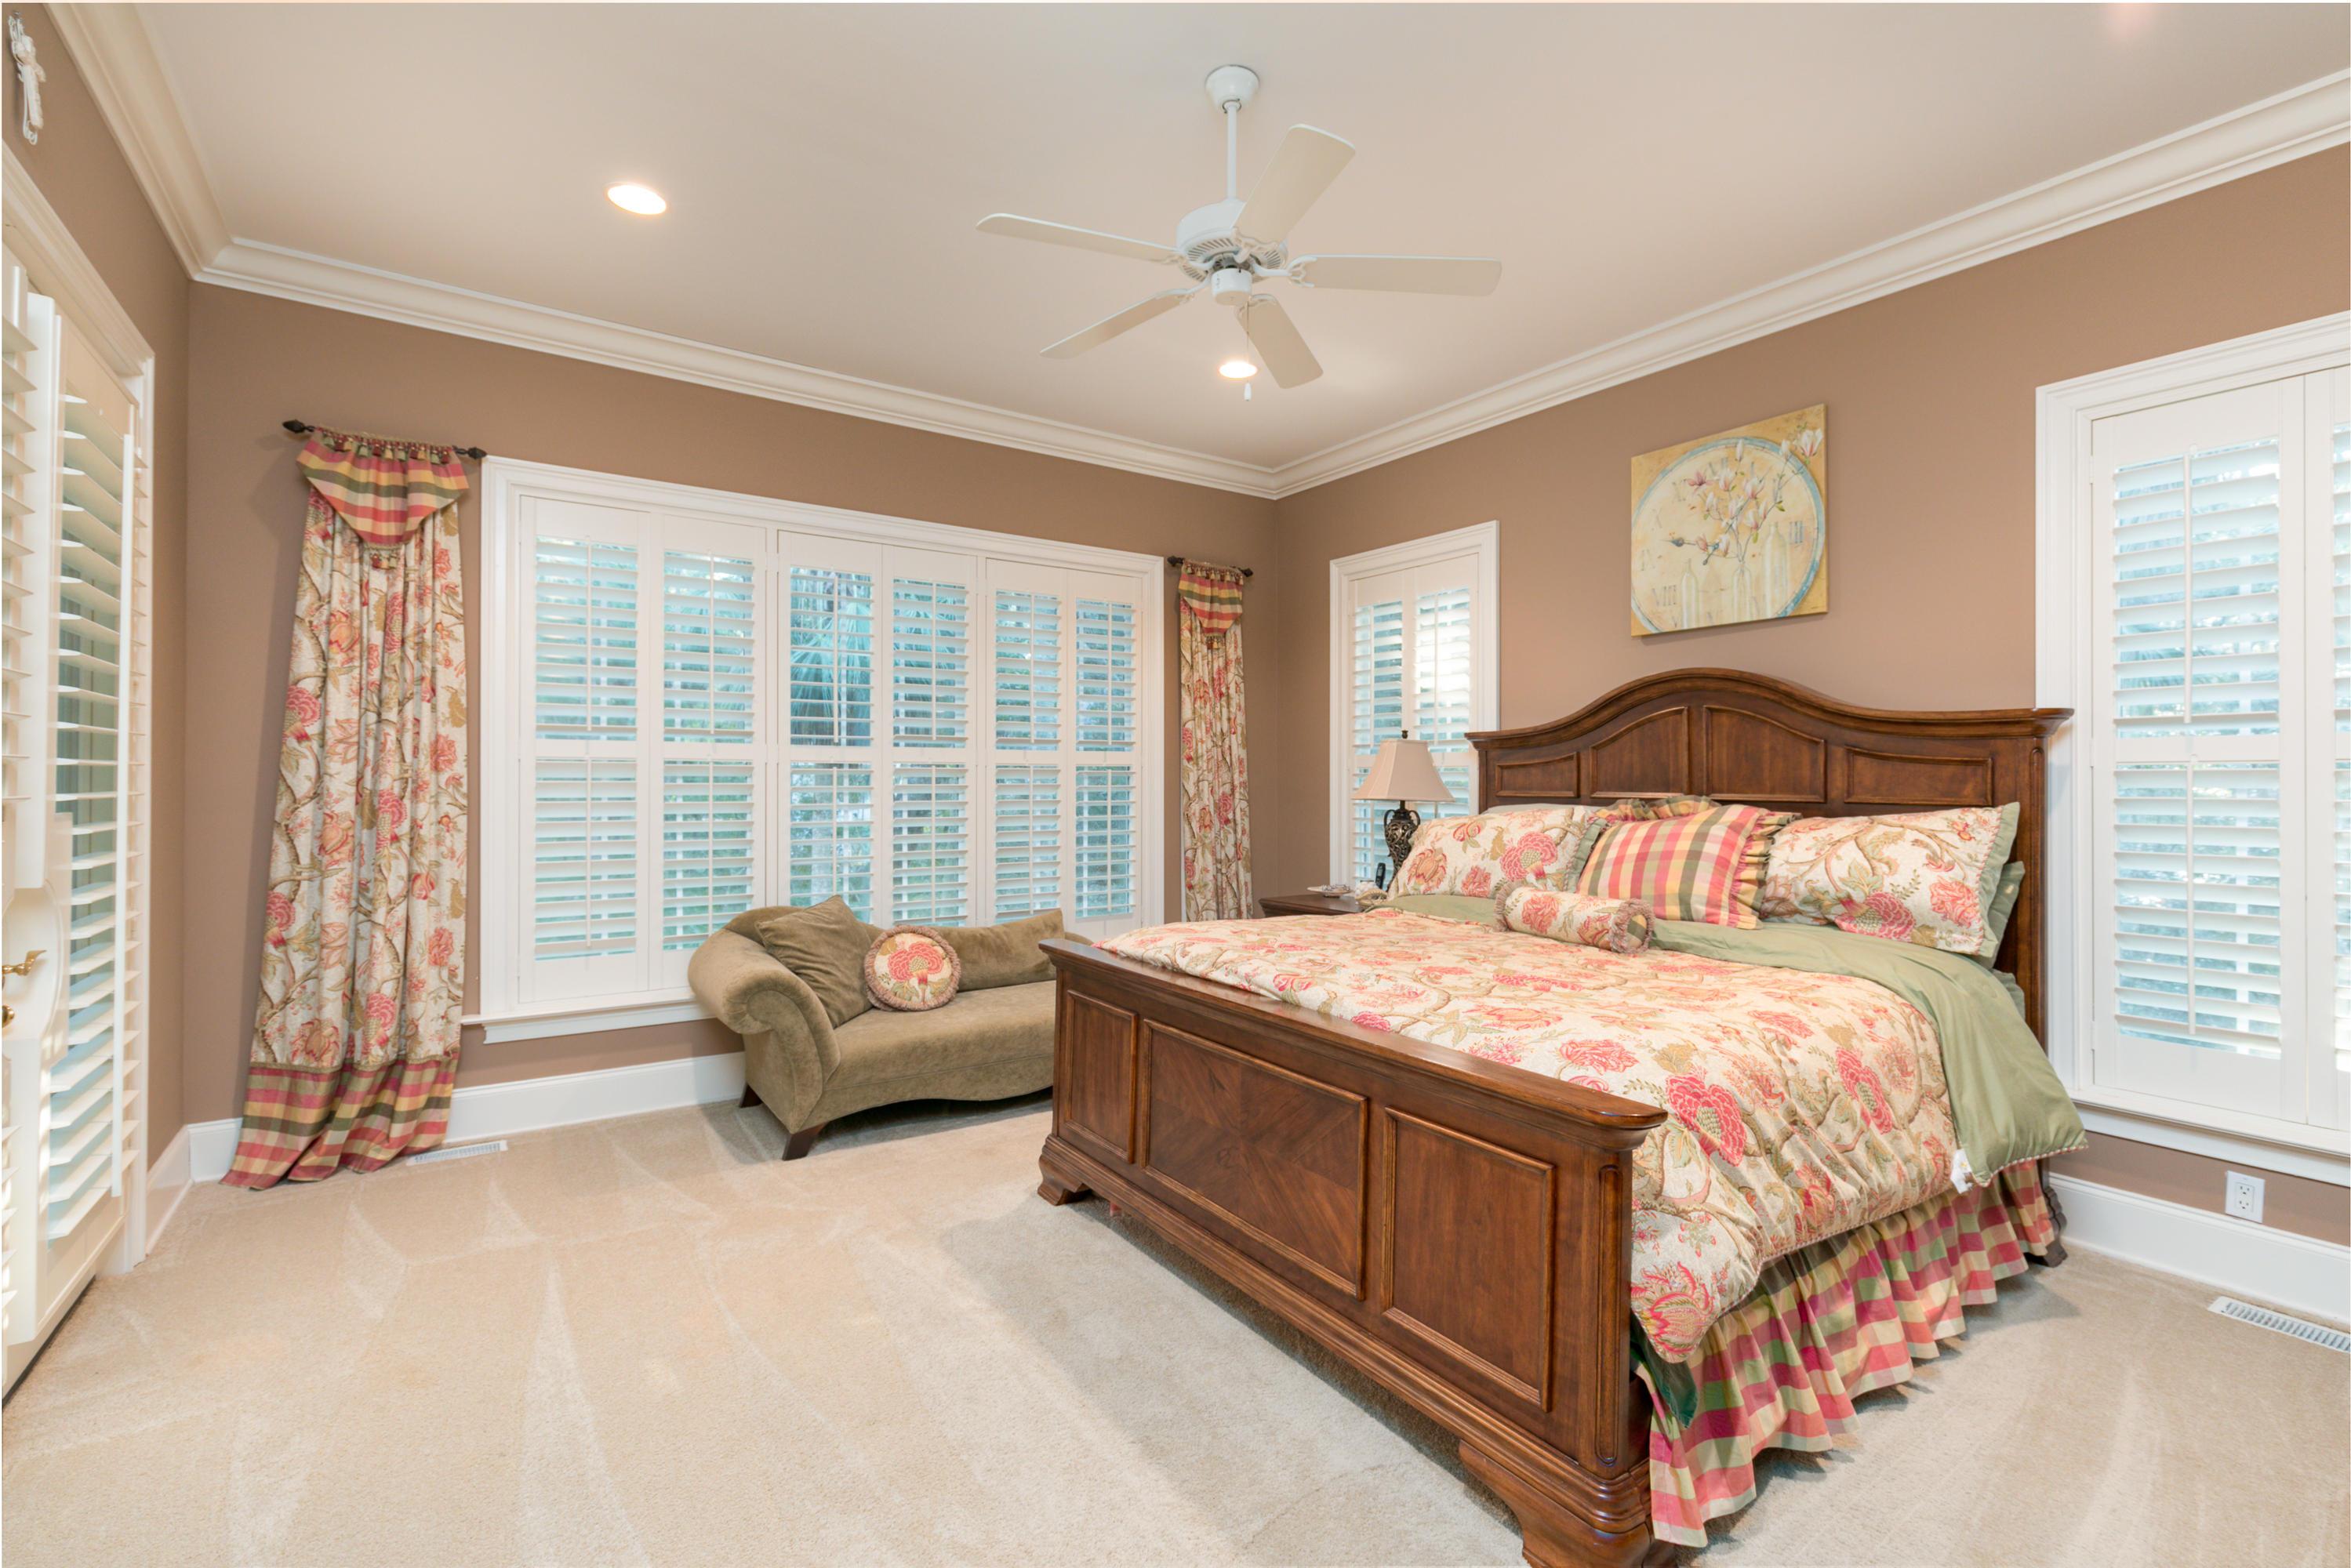 Seabrook Island Homes For Sale - 2701 Seabrook Island, Seabrook Island, SC - 51